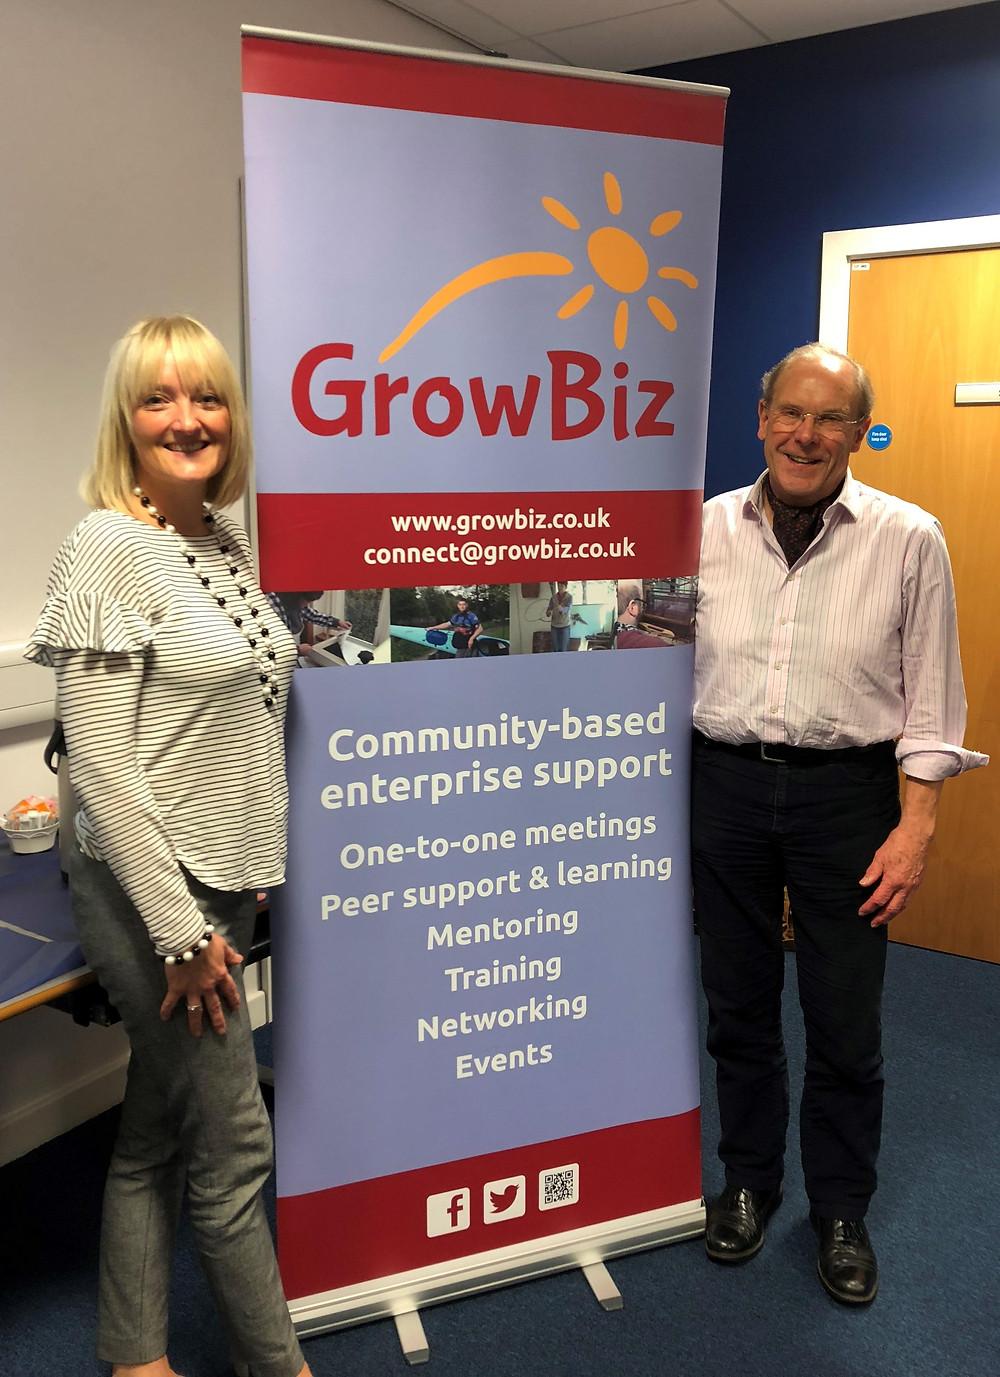 Clair Smith and Alan Garratt of GrowBiz